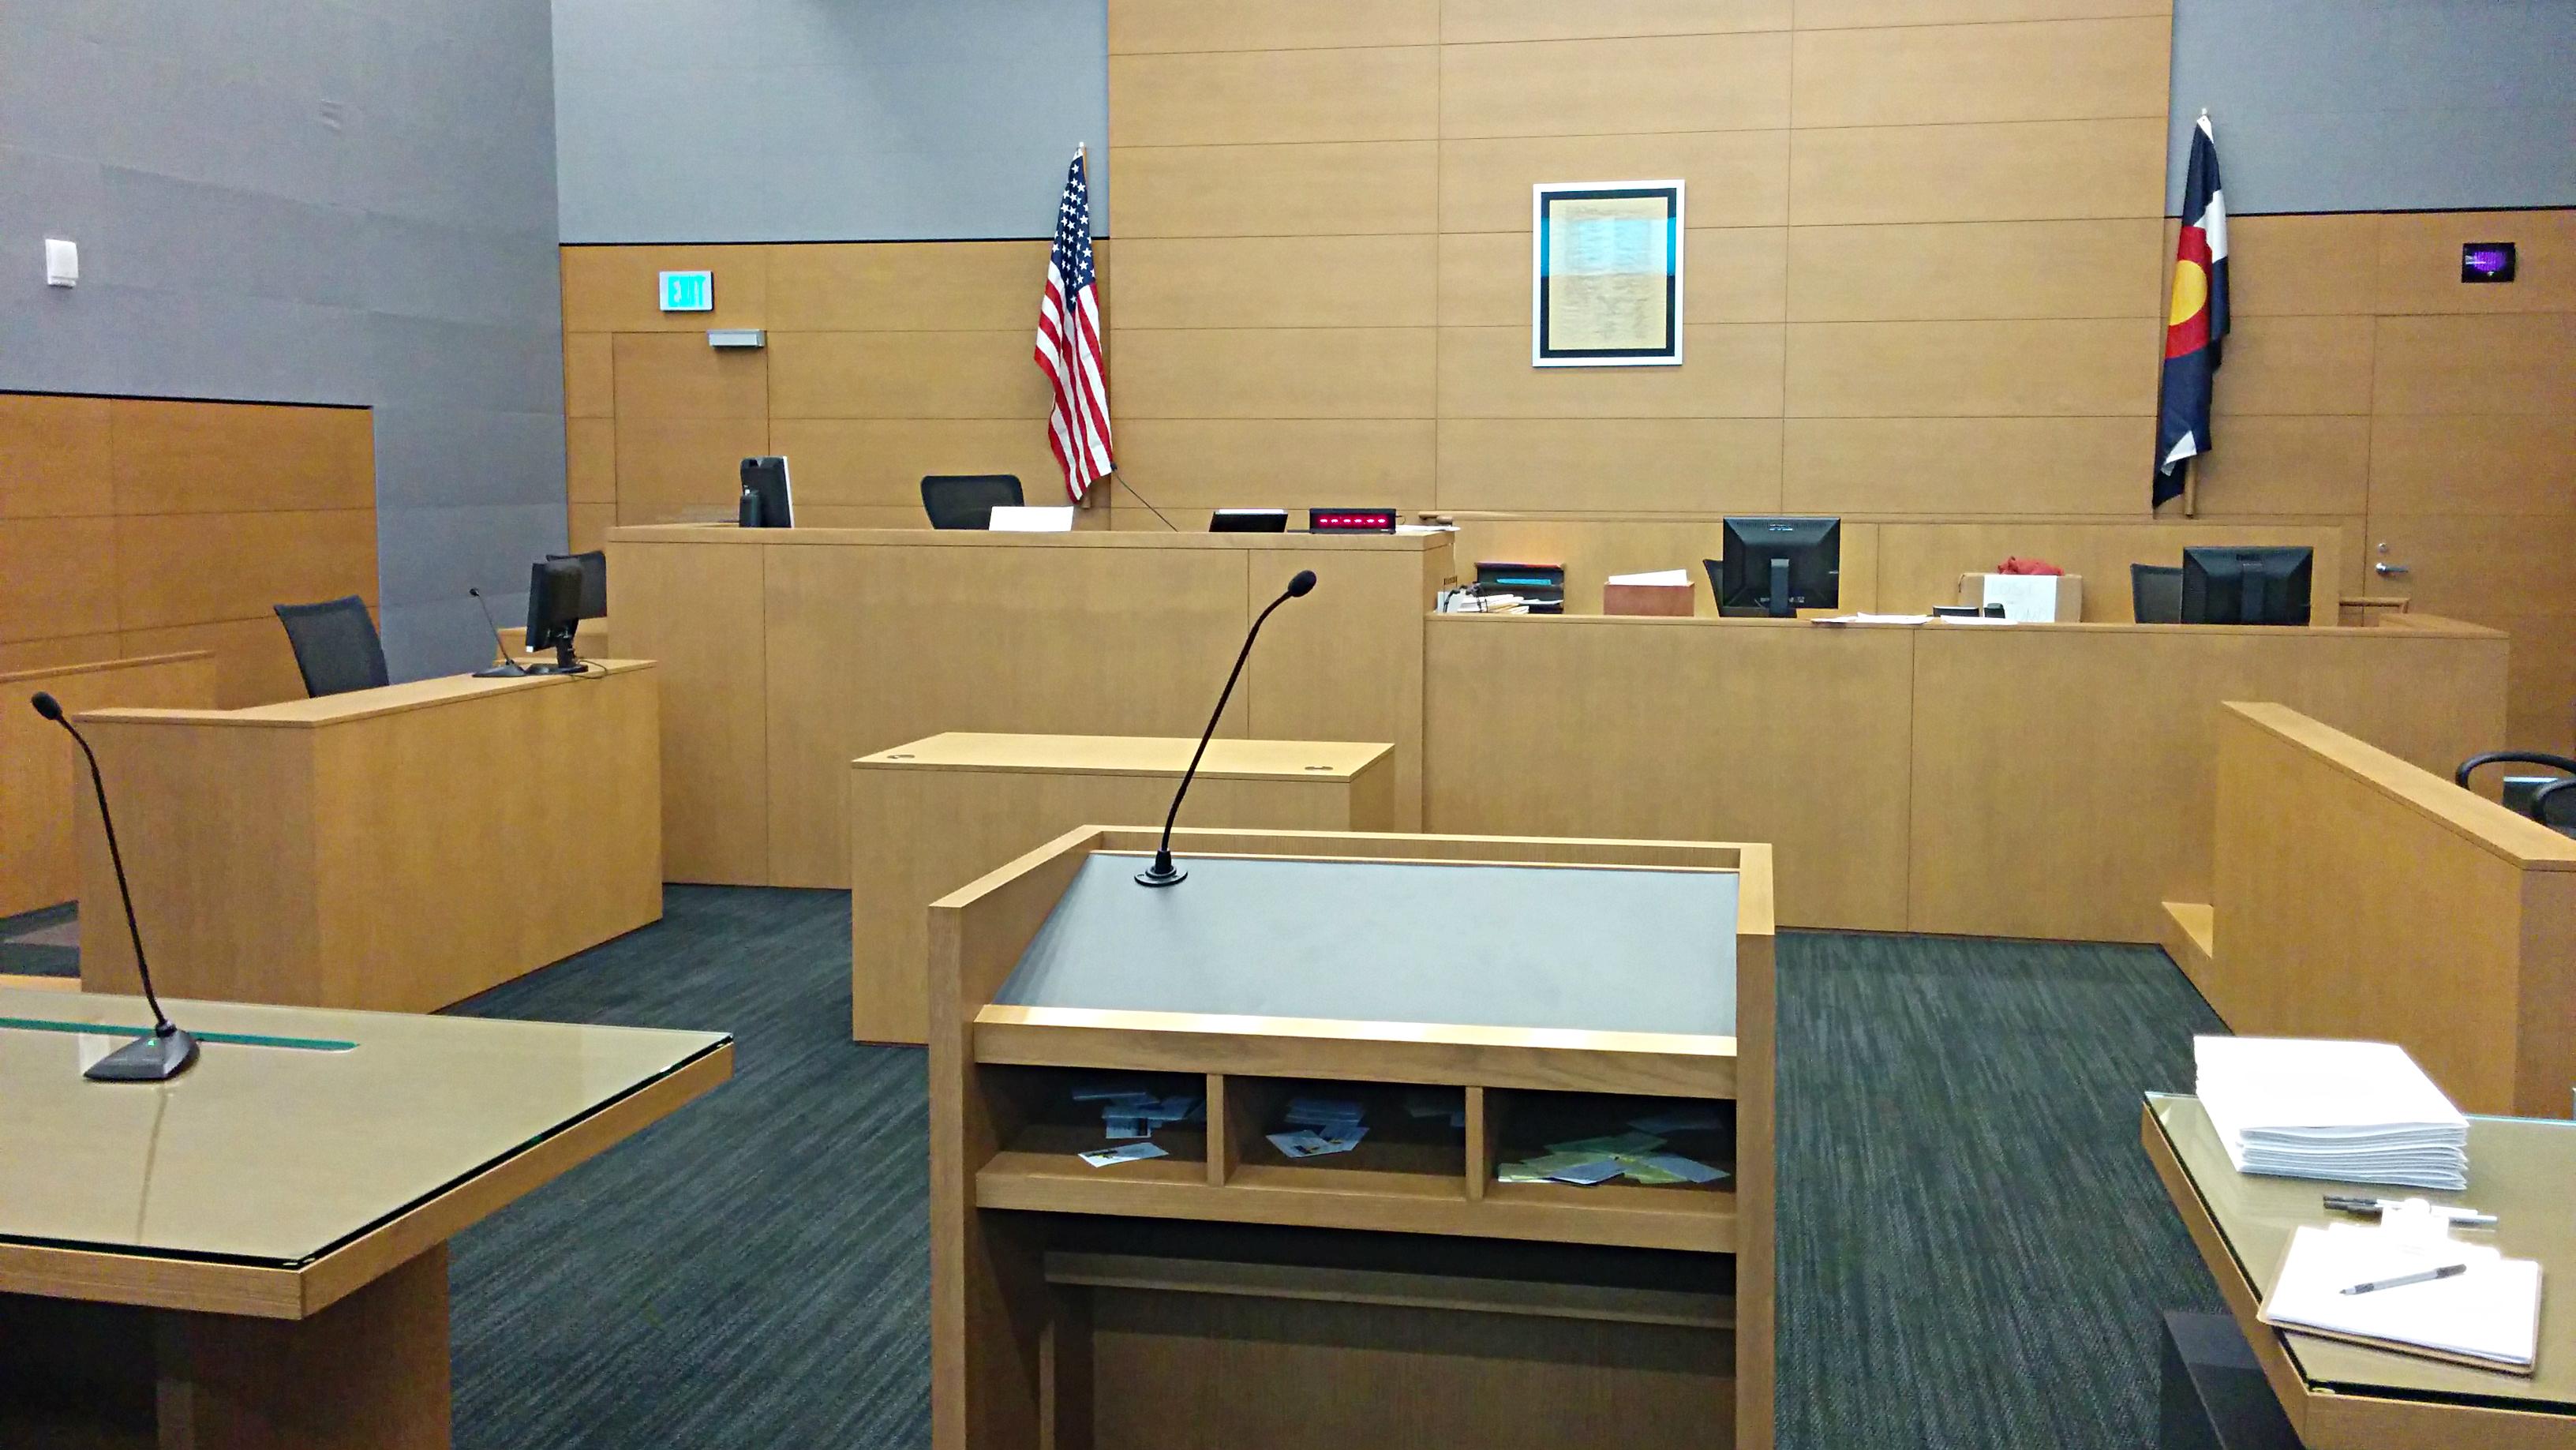 Photo: Courtroom for drug court